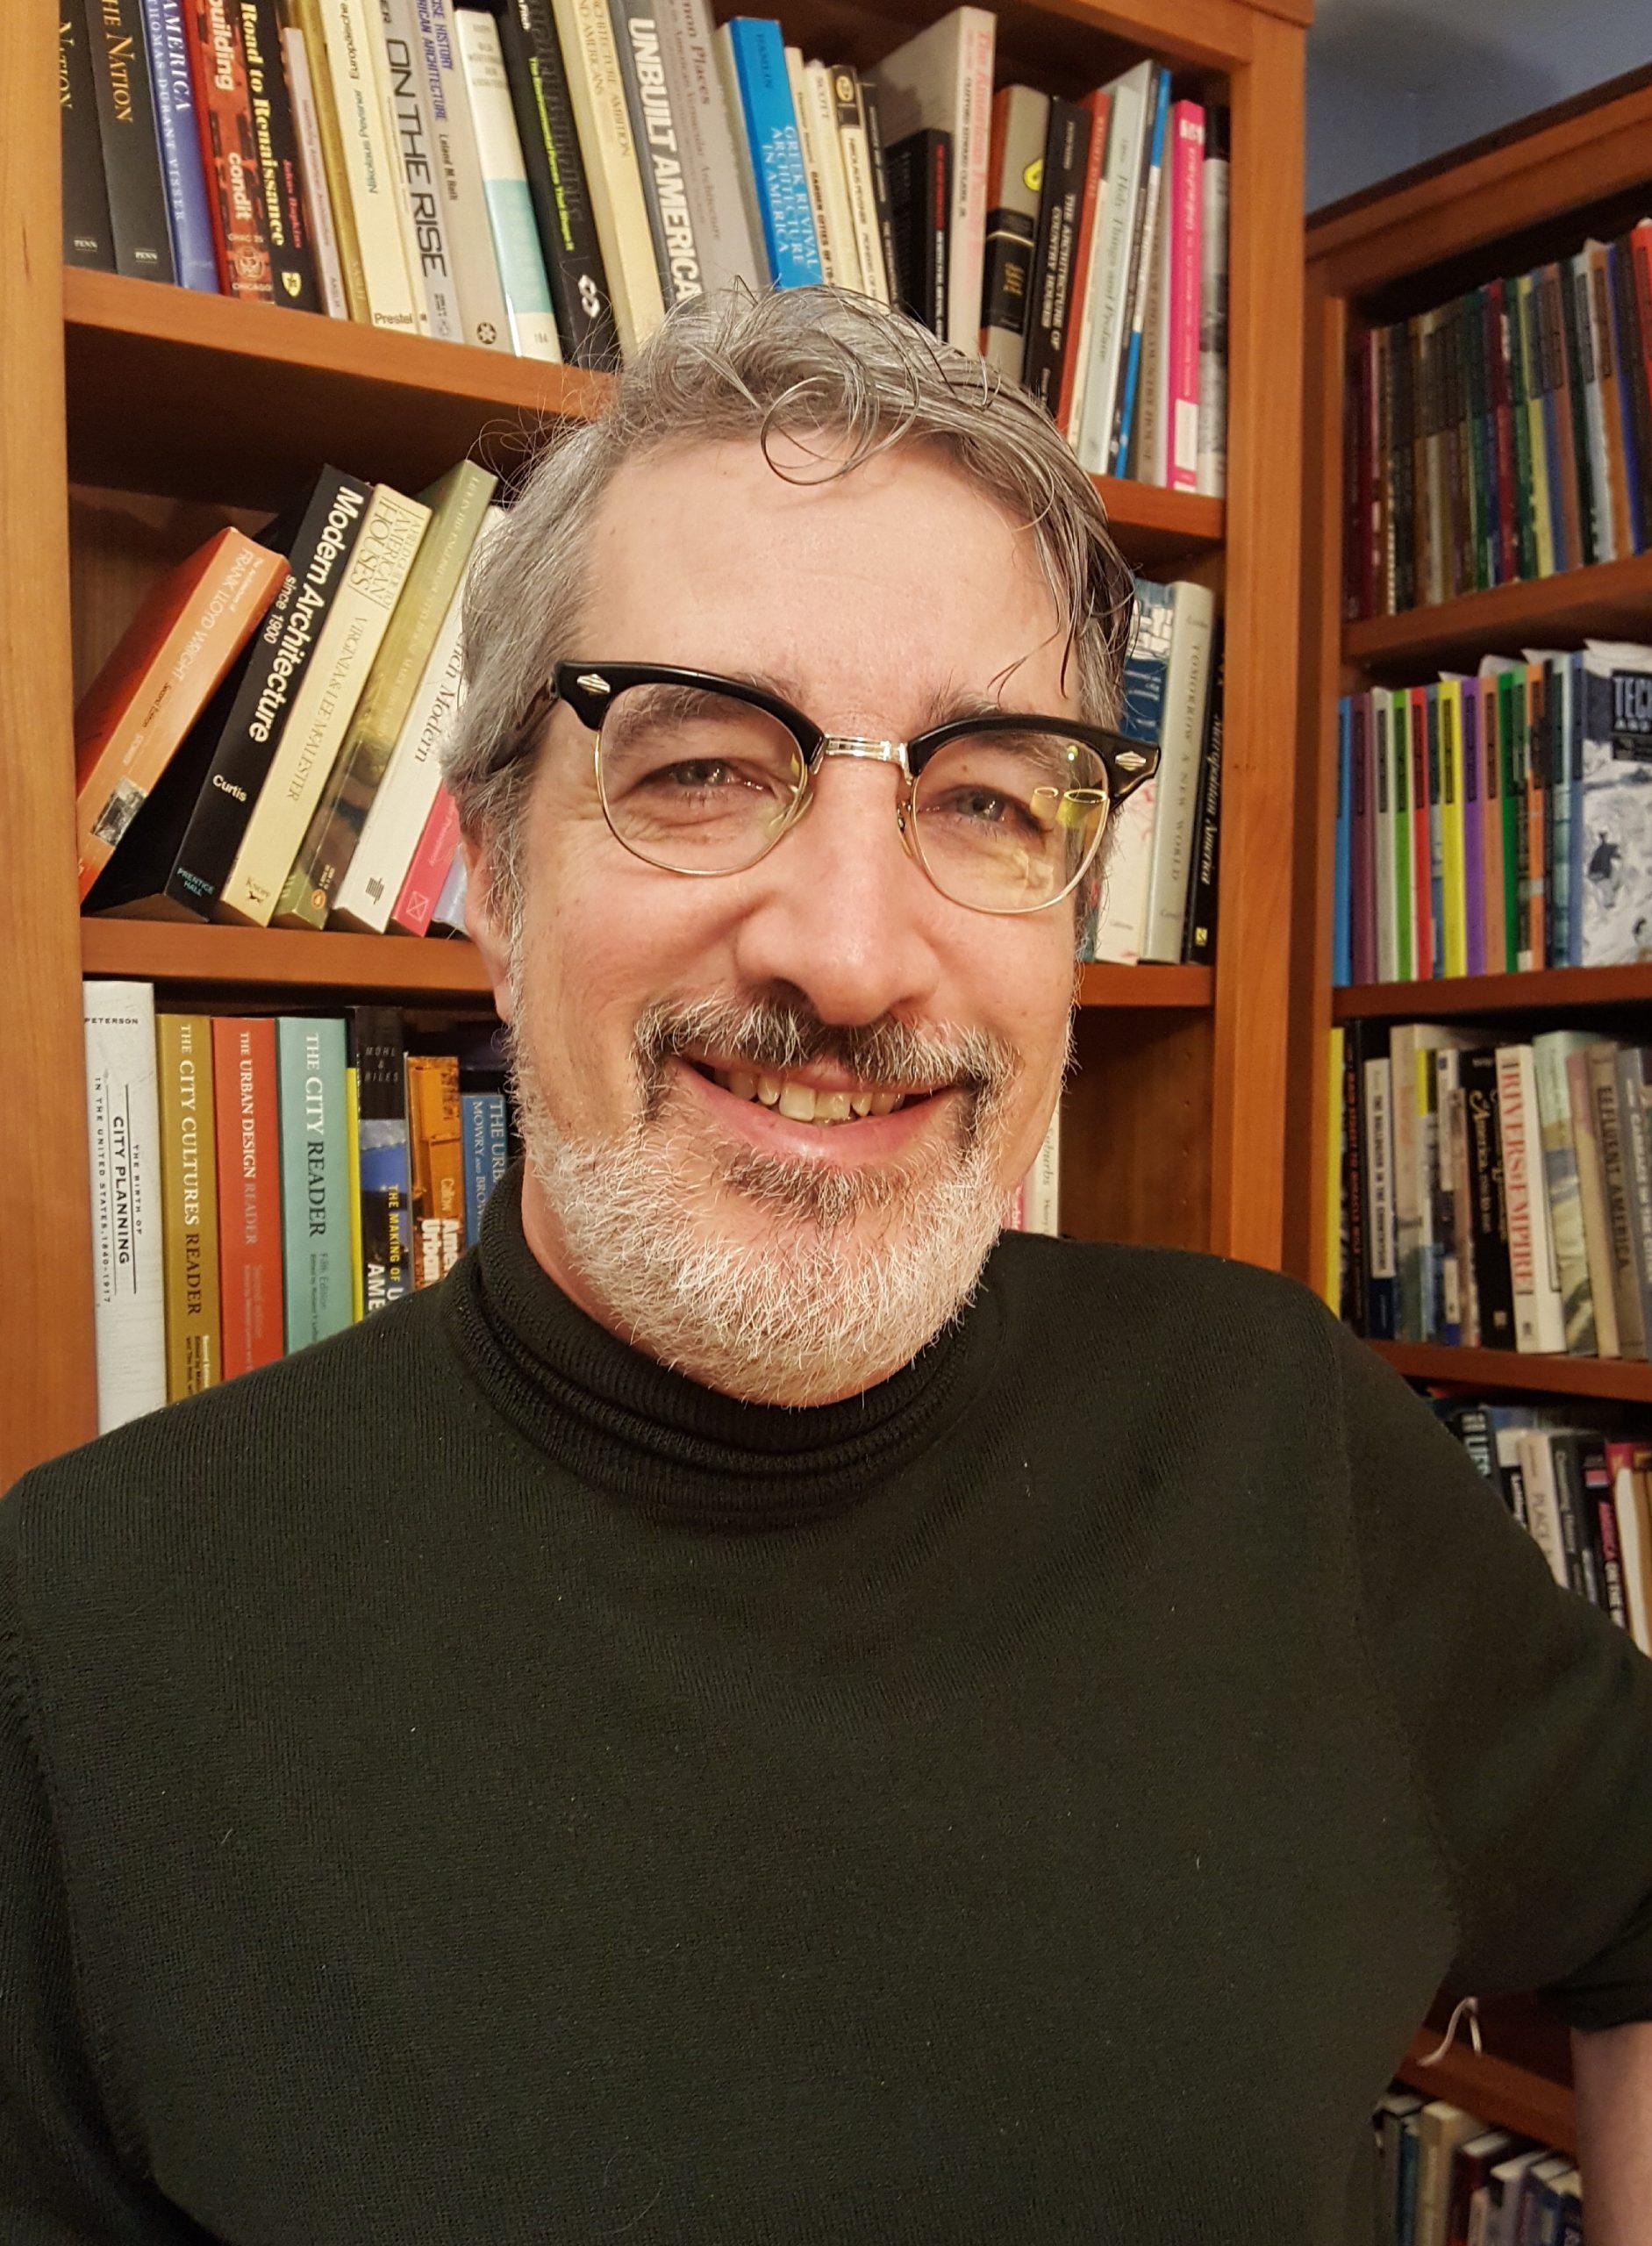 Headshot of Dr. Paul Jaskot